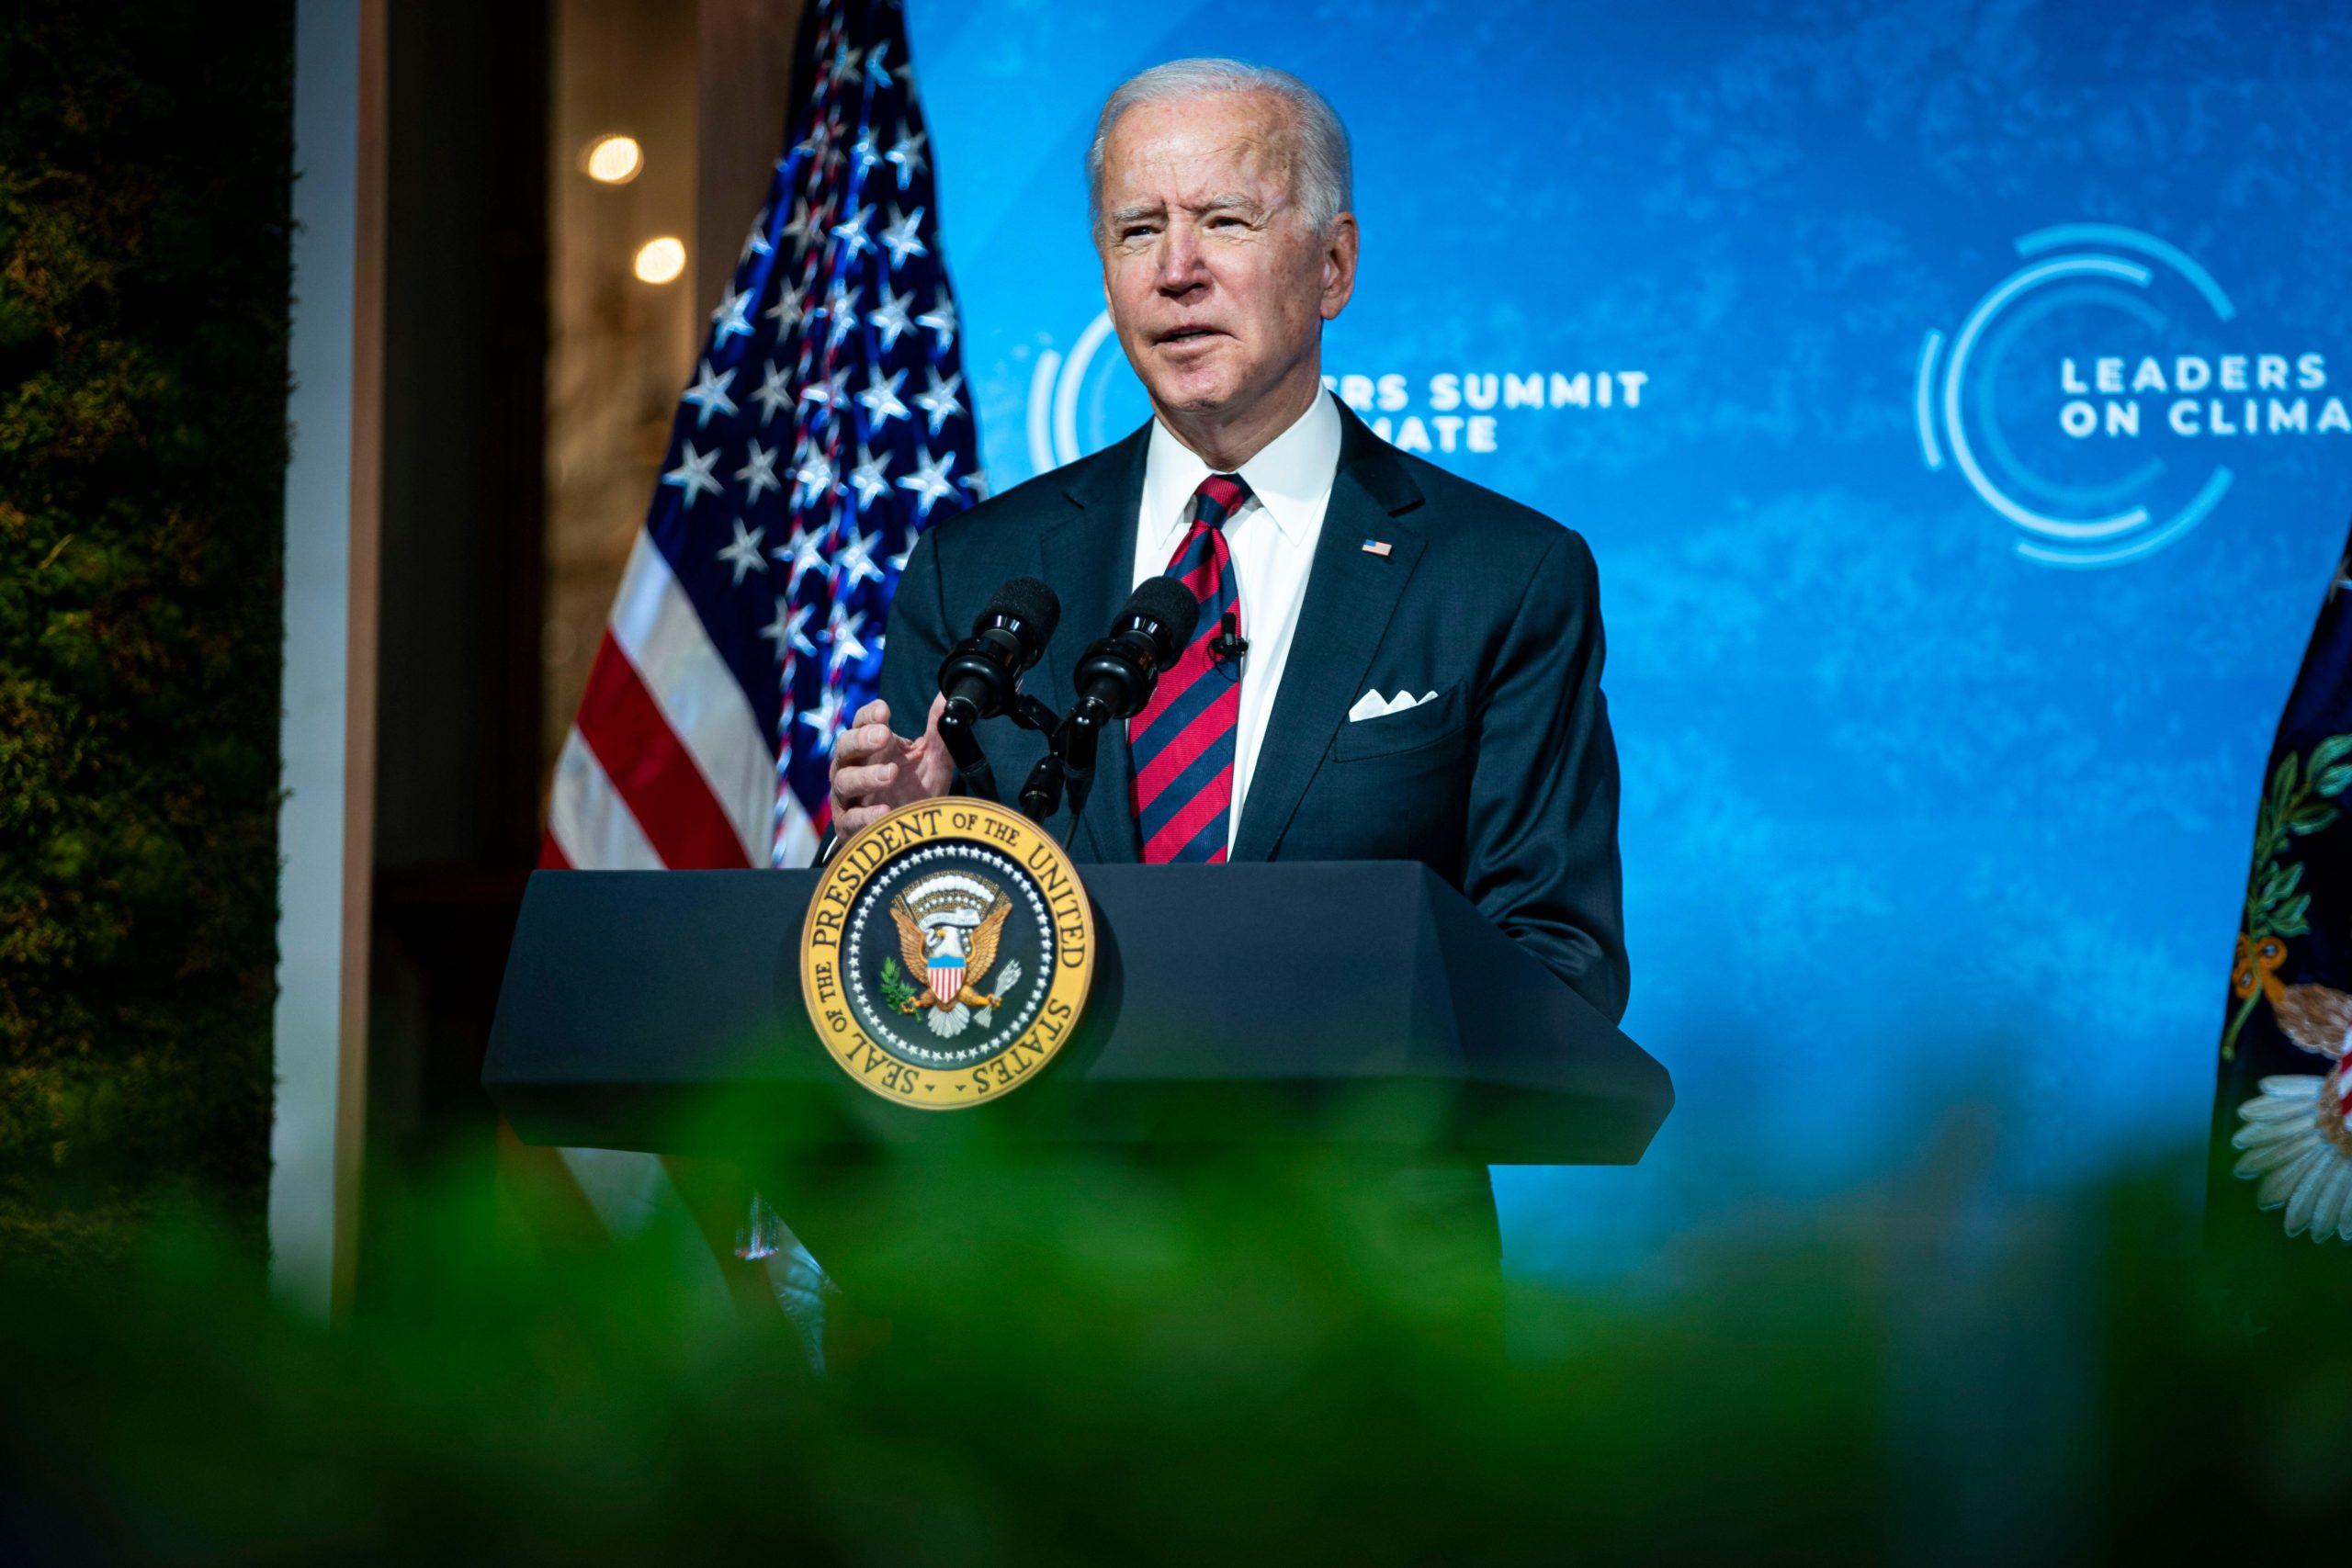 US president Joe Biden at the Leaders Summit on Climate